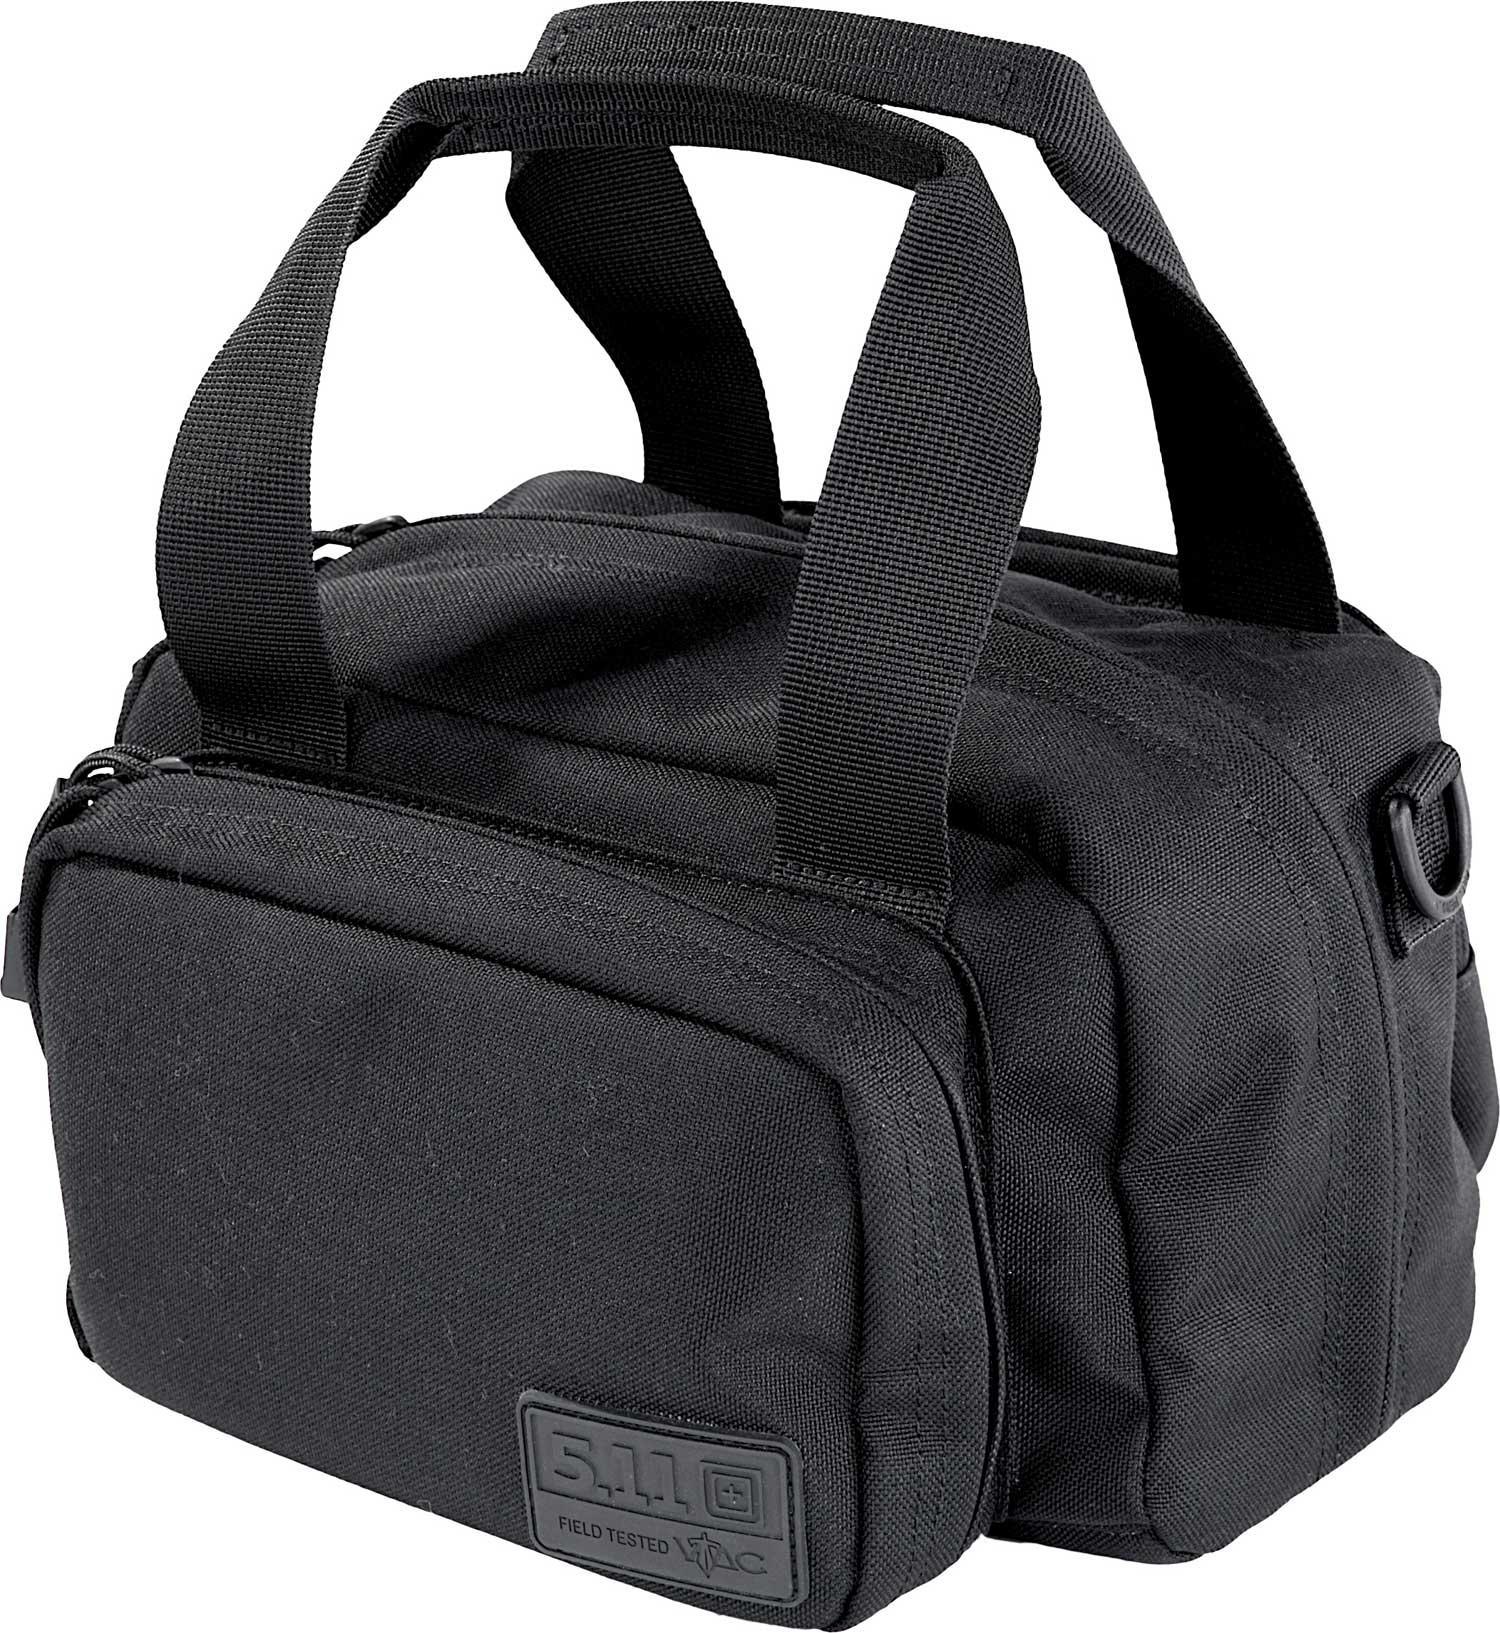 5.11 Tactical Small Kit Bag Black